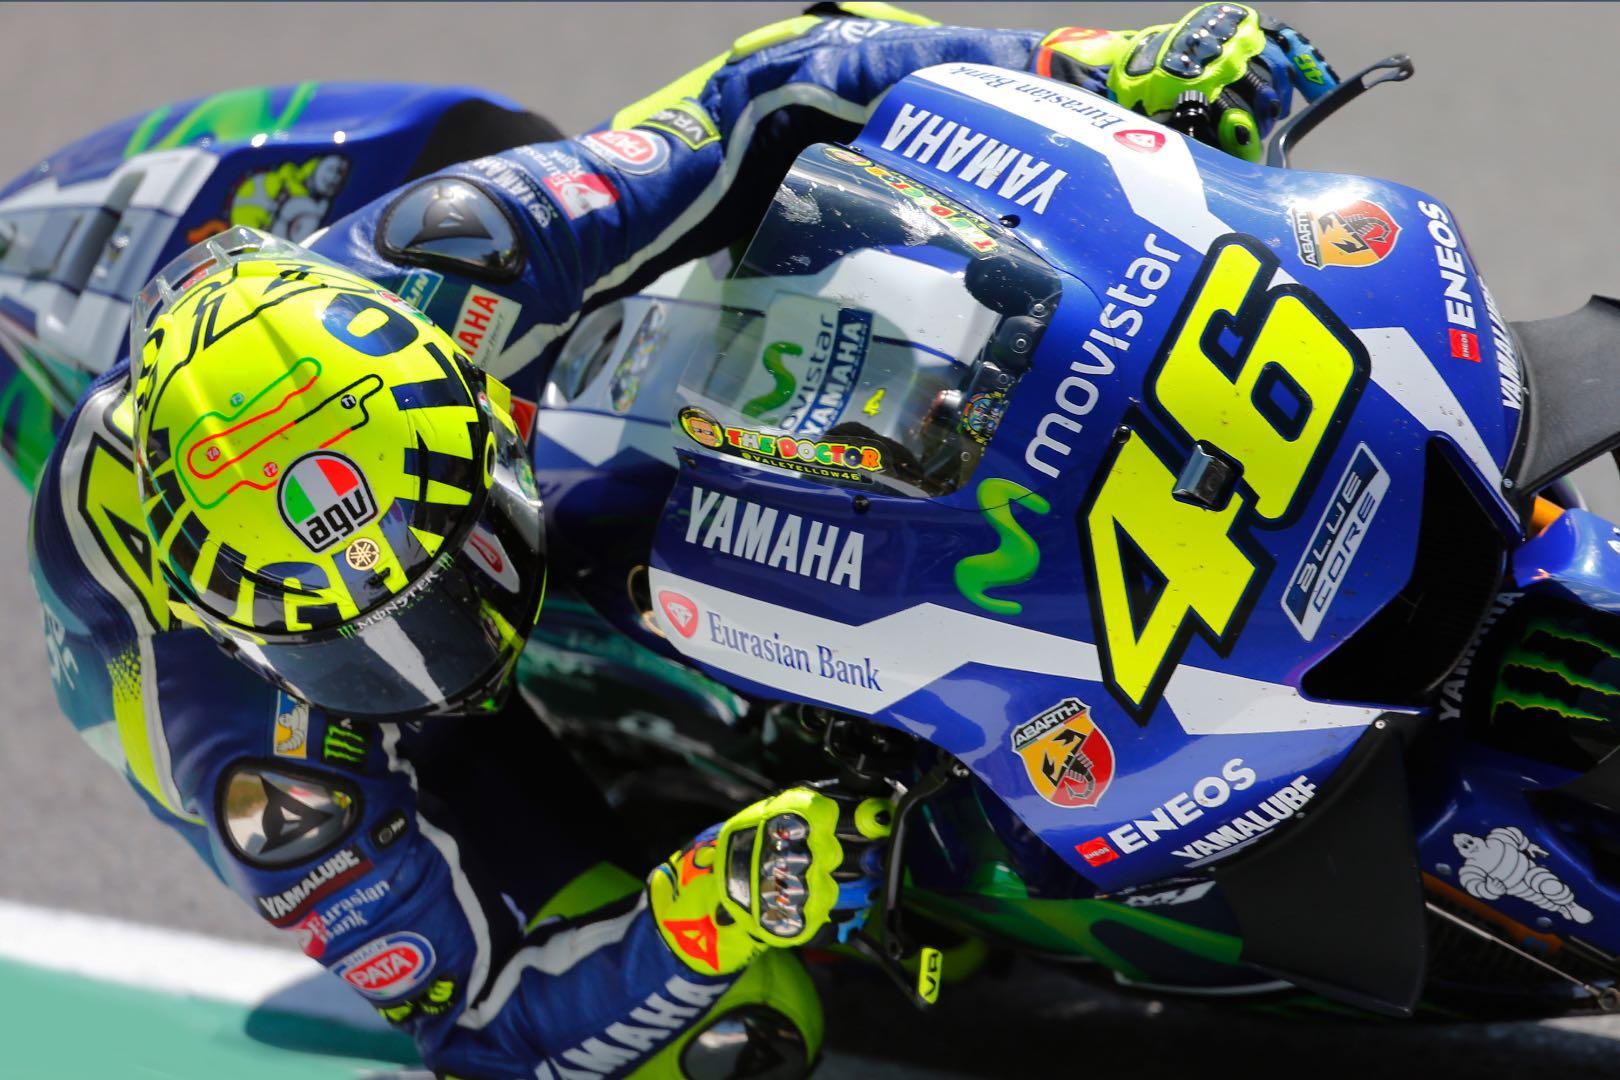 Valentino Rossi Injury Update Vr46 Fit To Ride Mugello Motogp